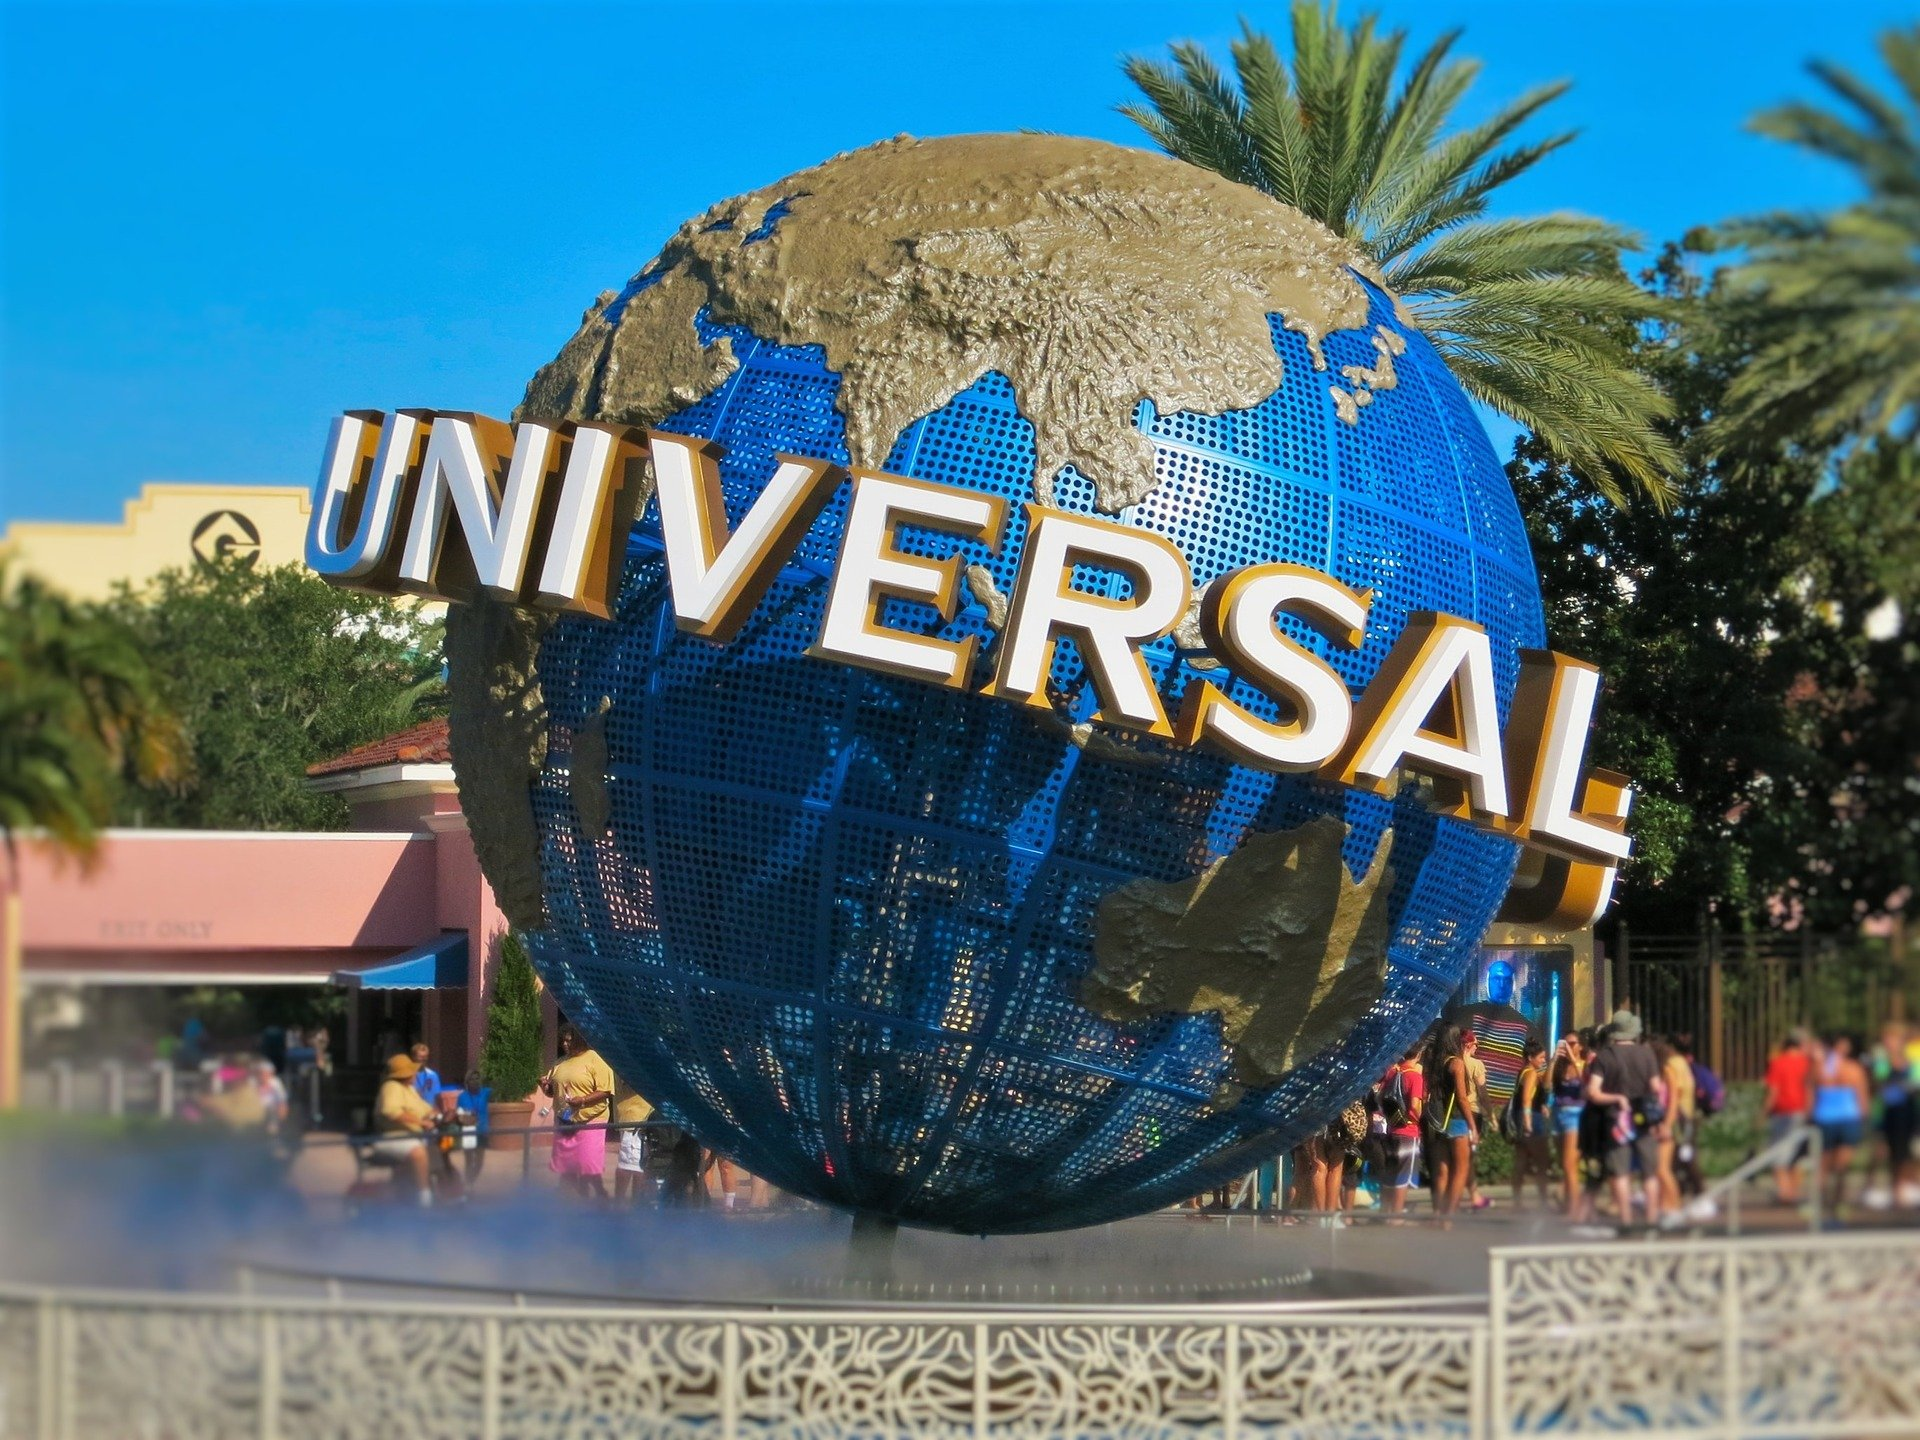 universal-studios-1640516_1920